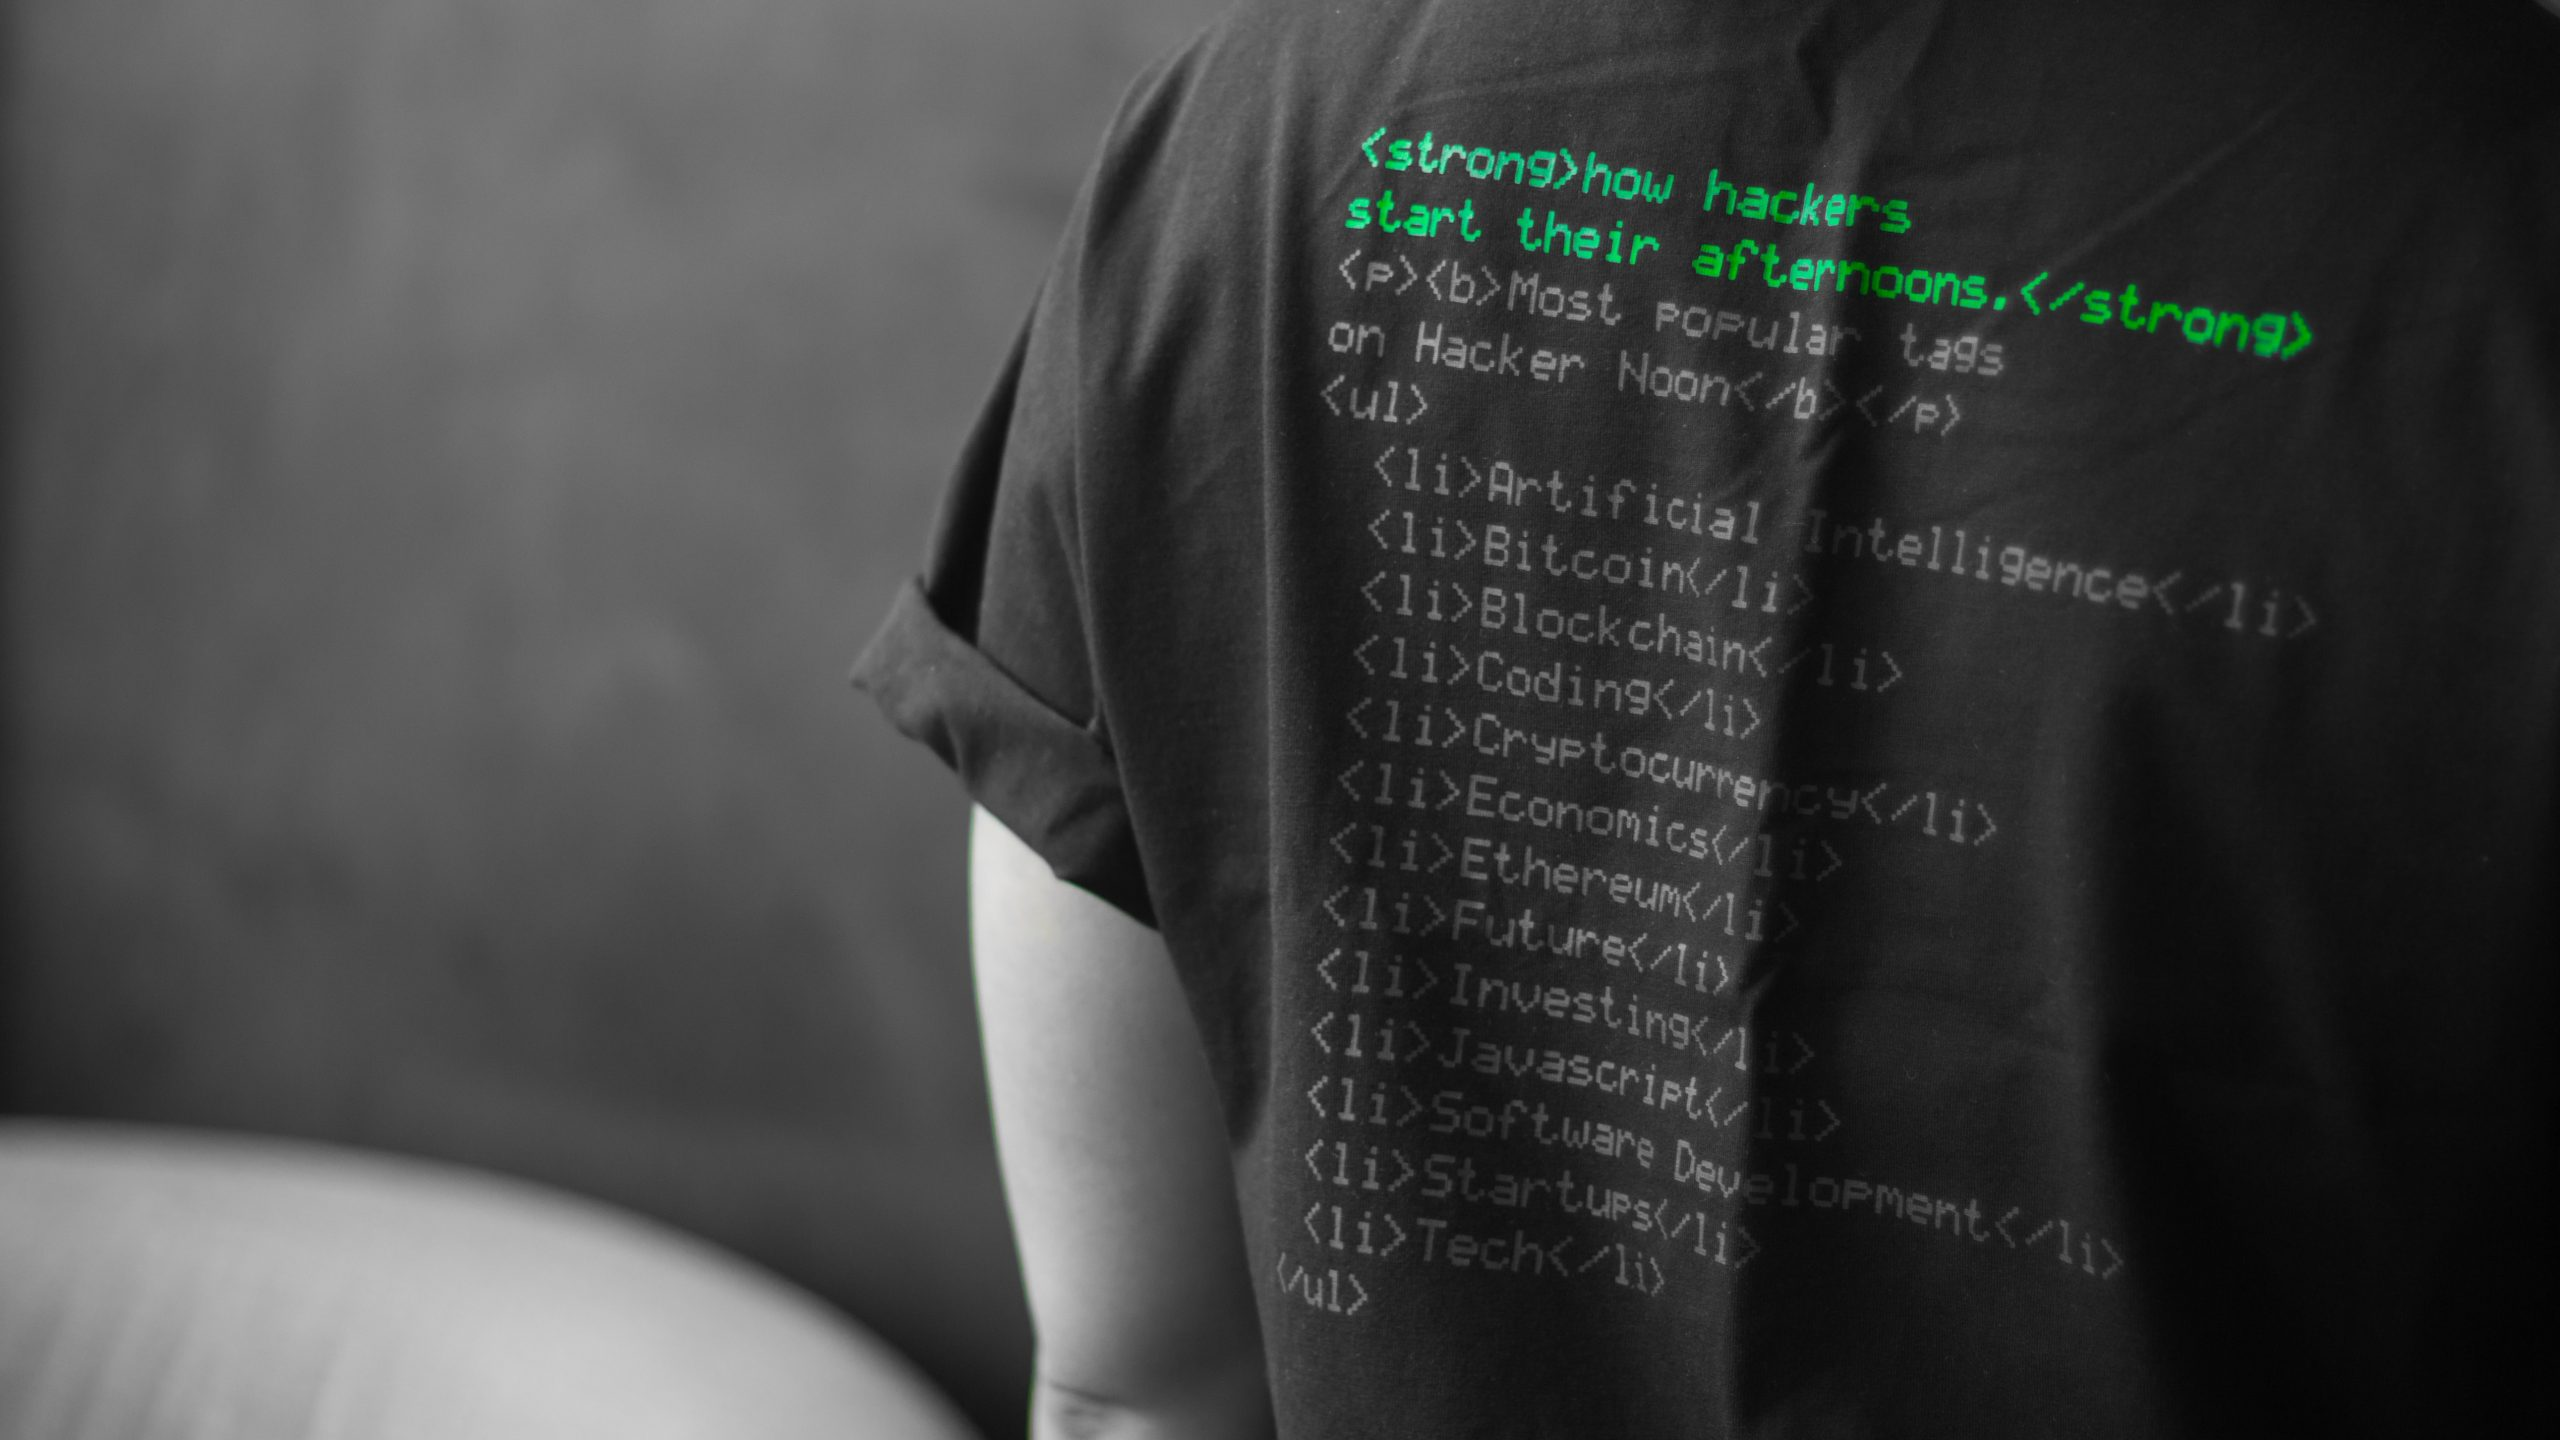 Hacker PC Virus Ataque Ransomware REvil tshirt code ddos